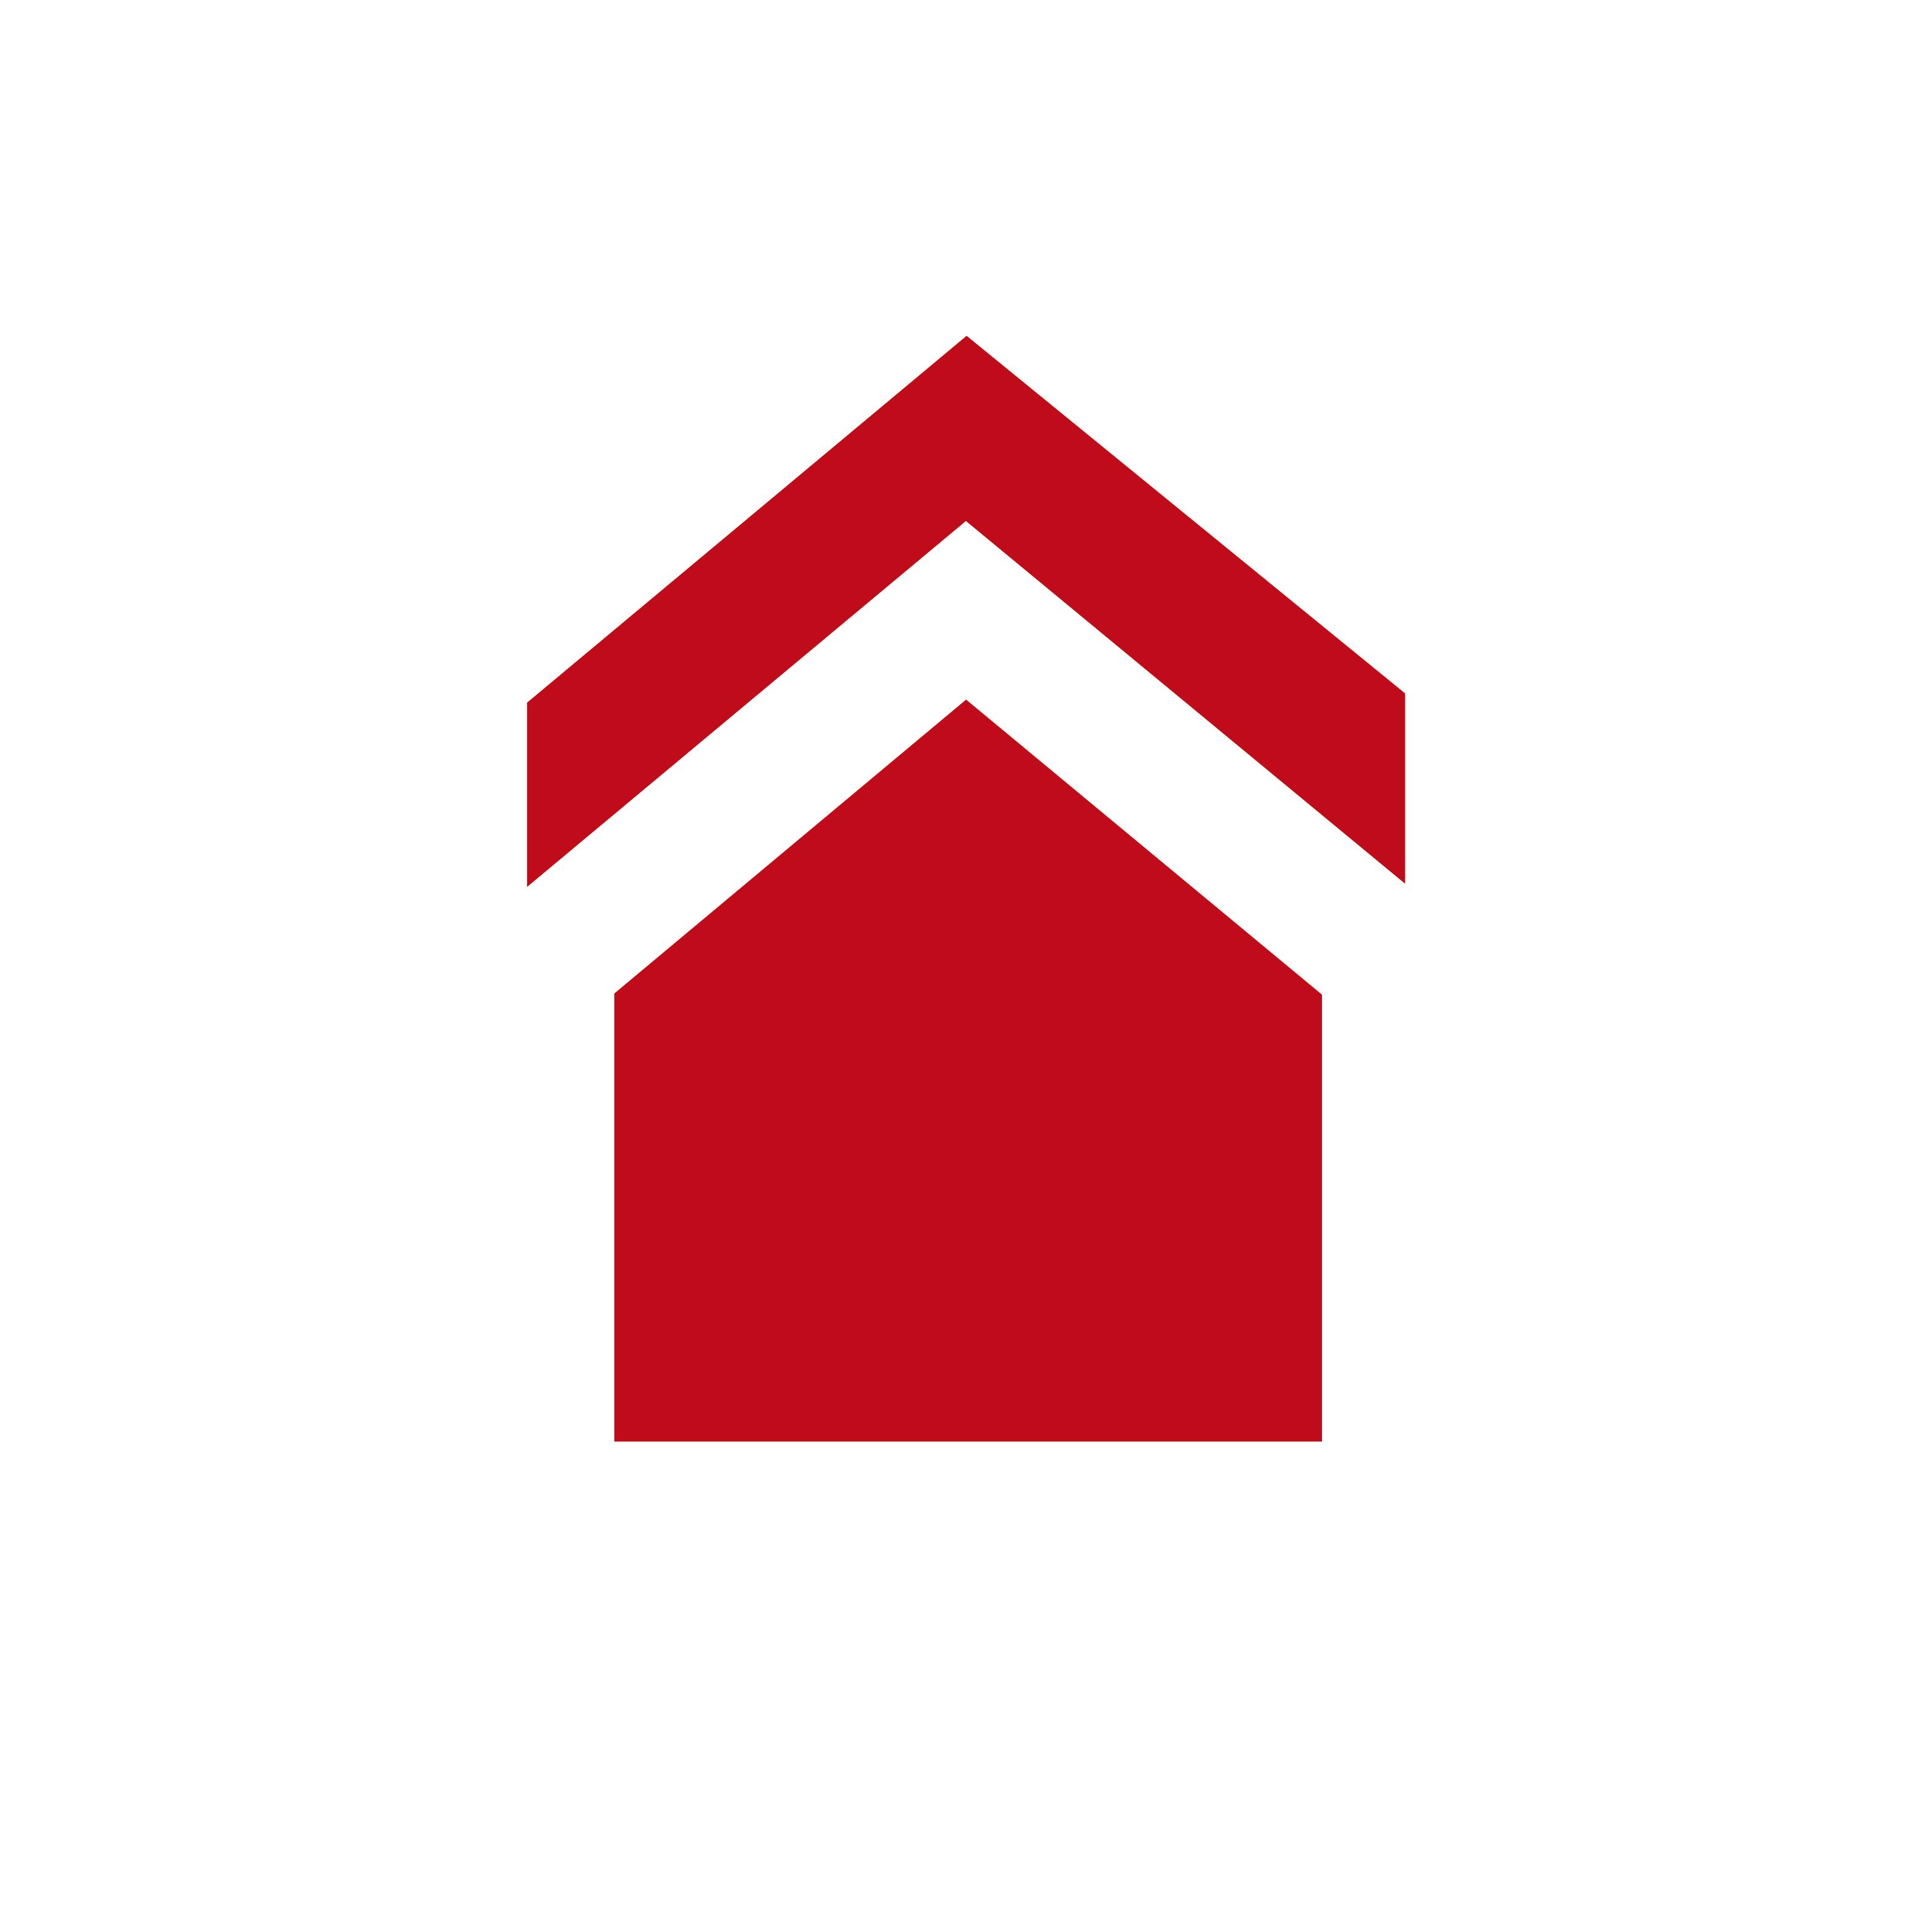 Angebot-icon